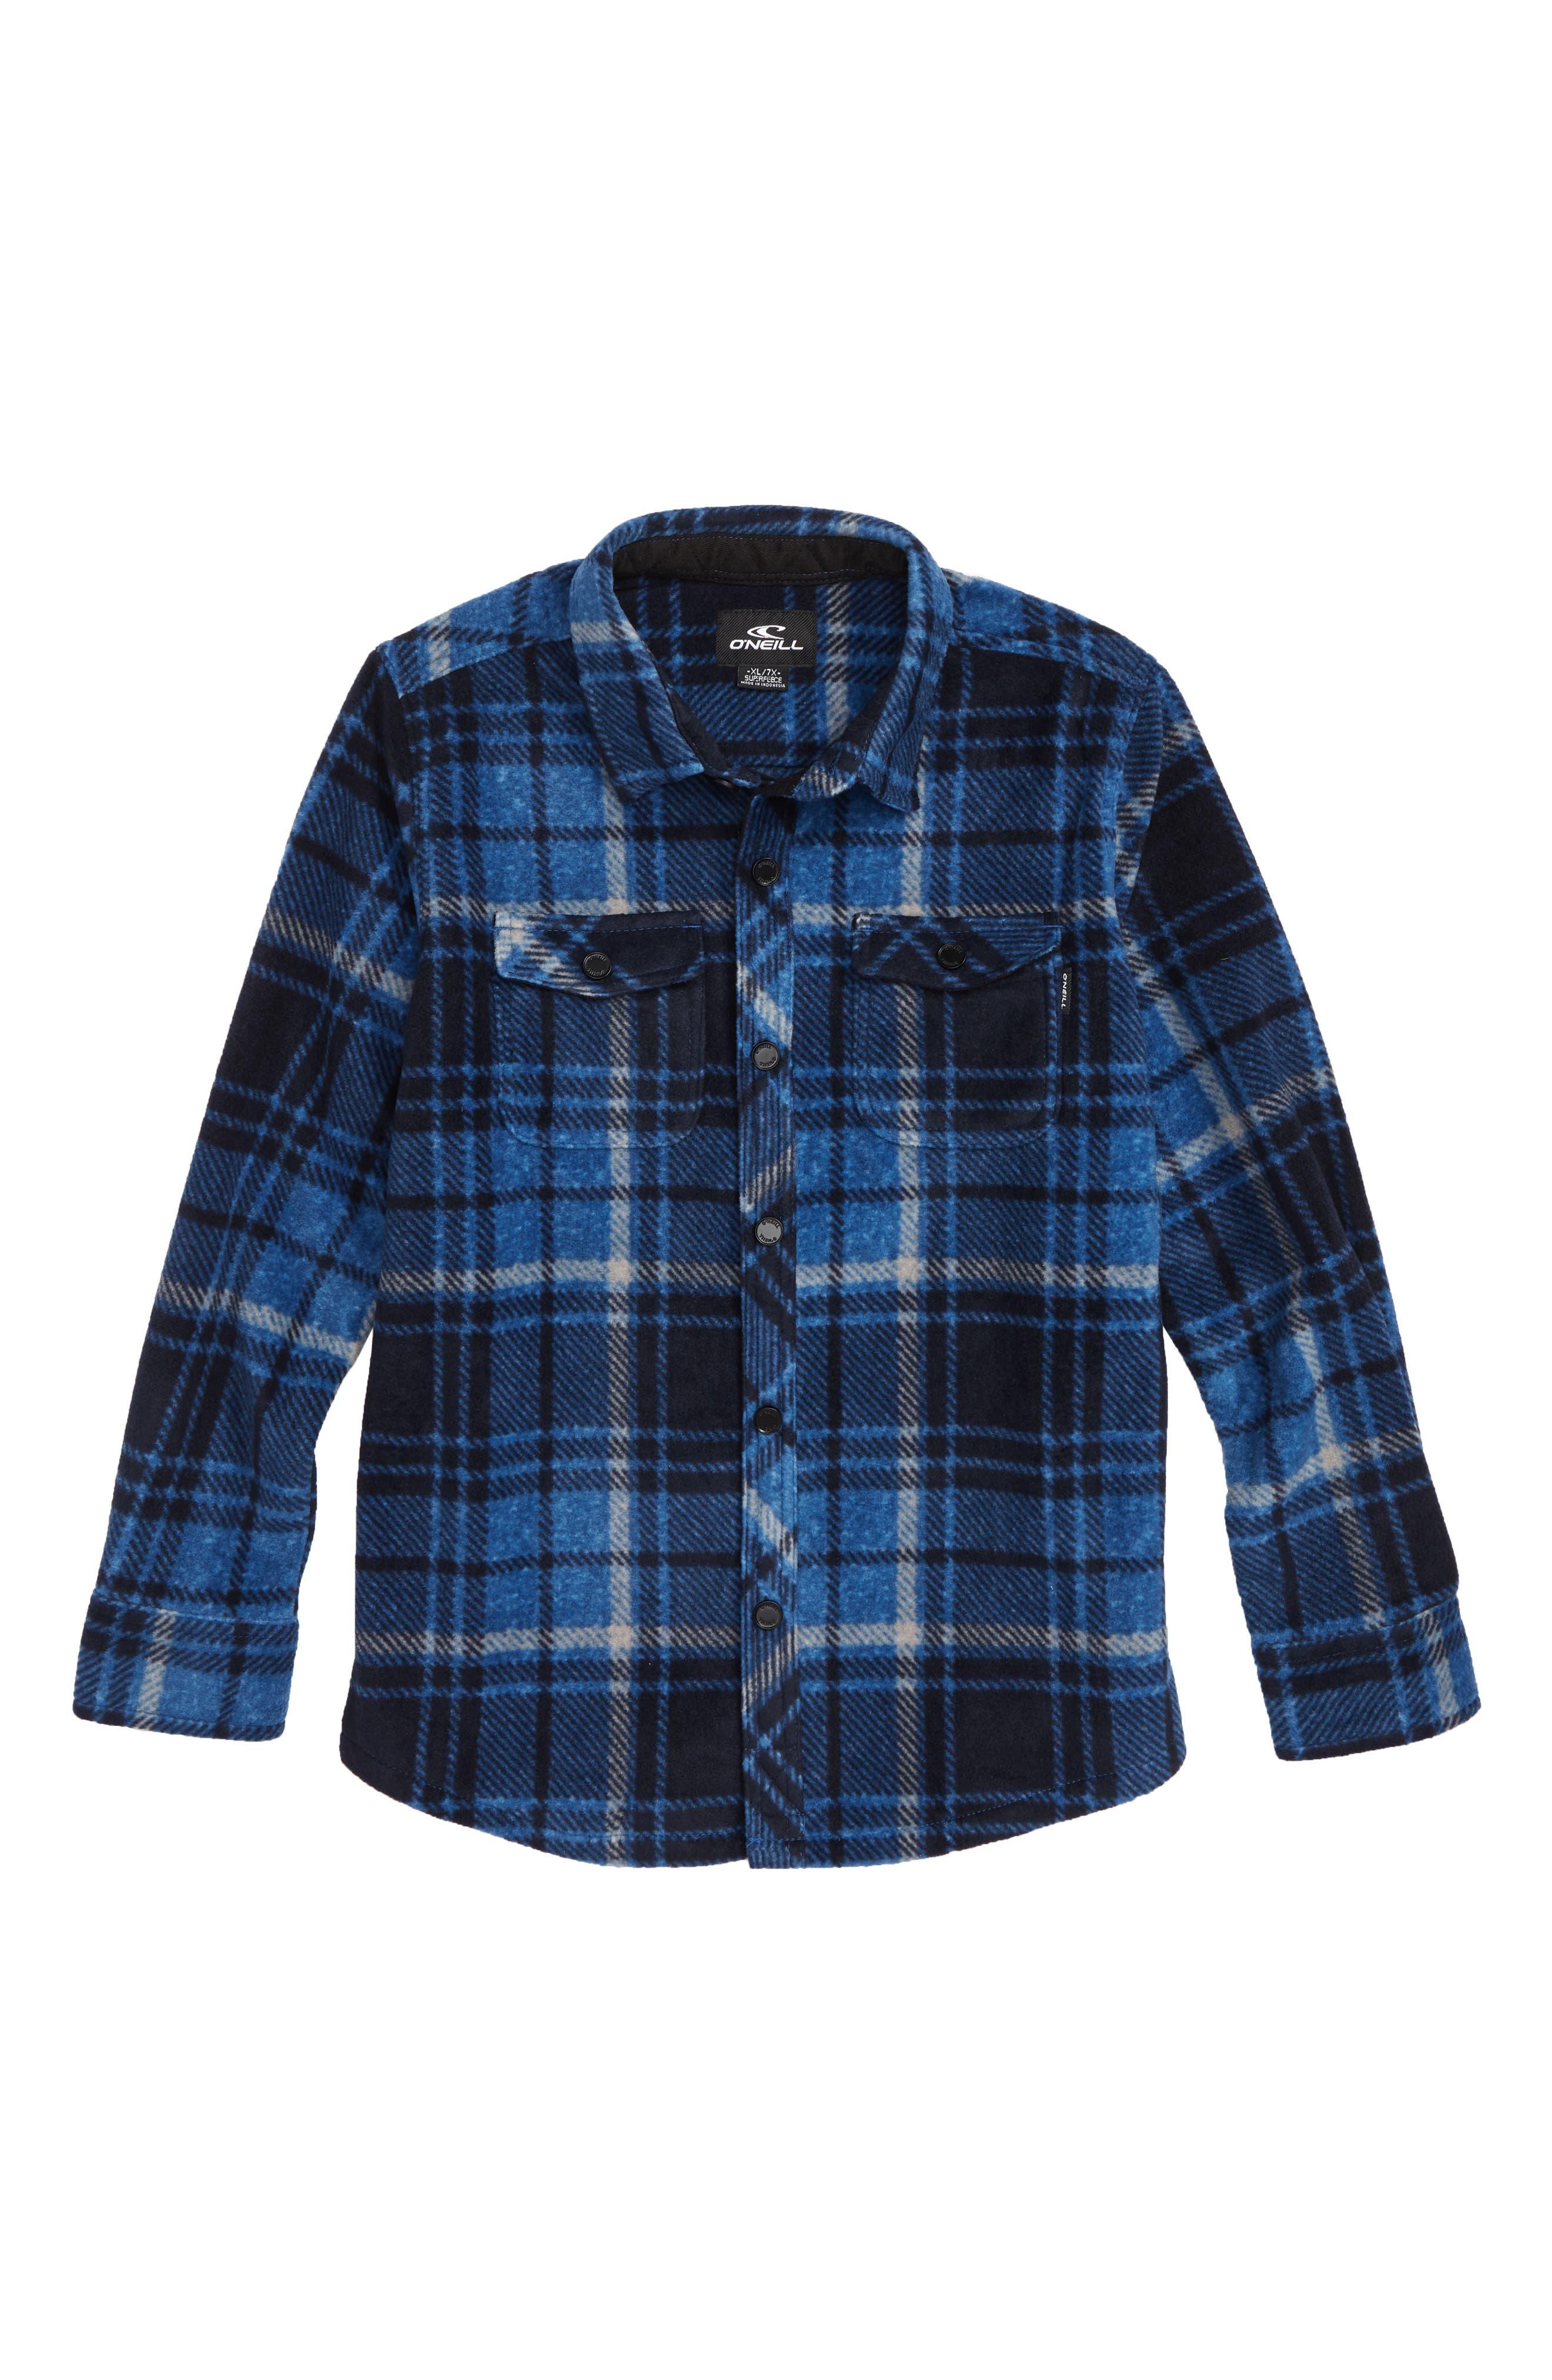 Glacier Plaid Super Fleece Shirt,                         Main,                         color, DARK BLUE